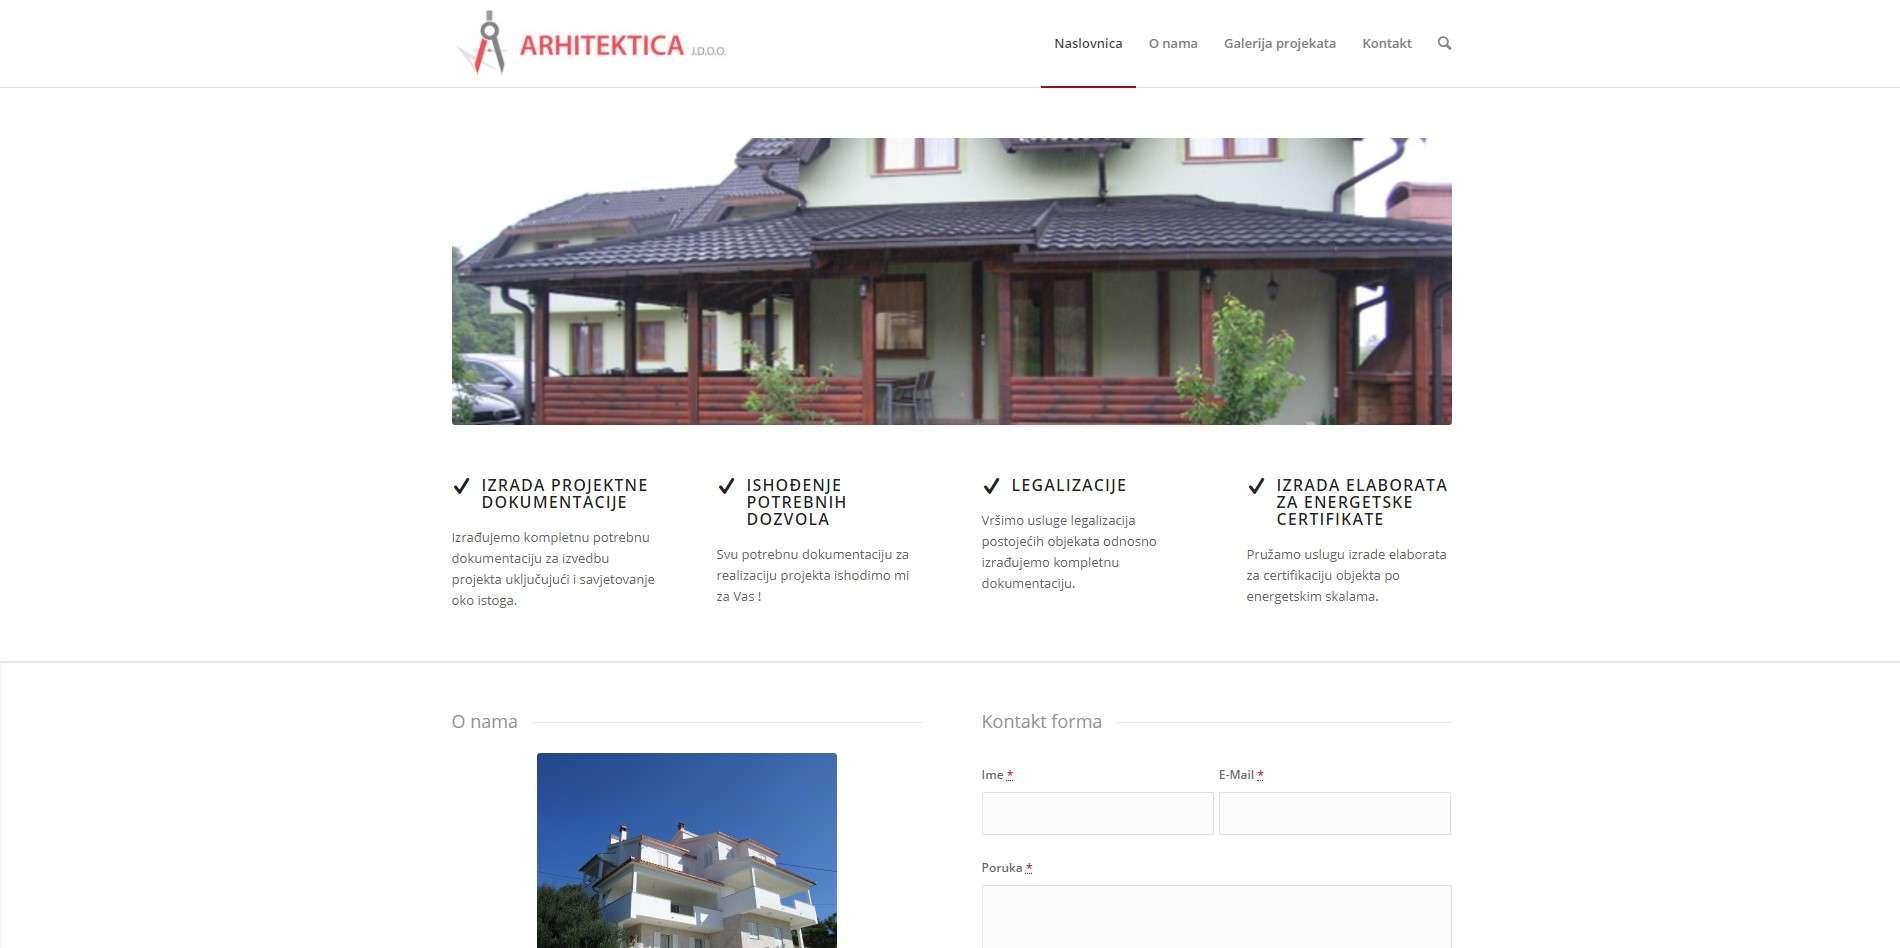 Arhitektica